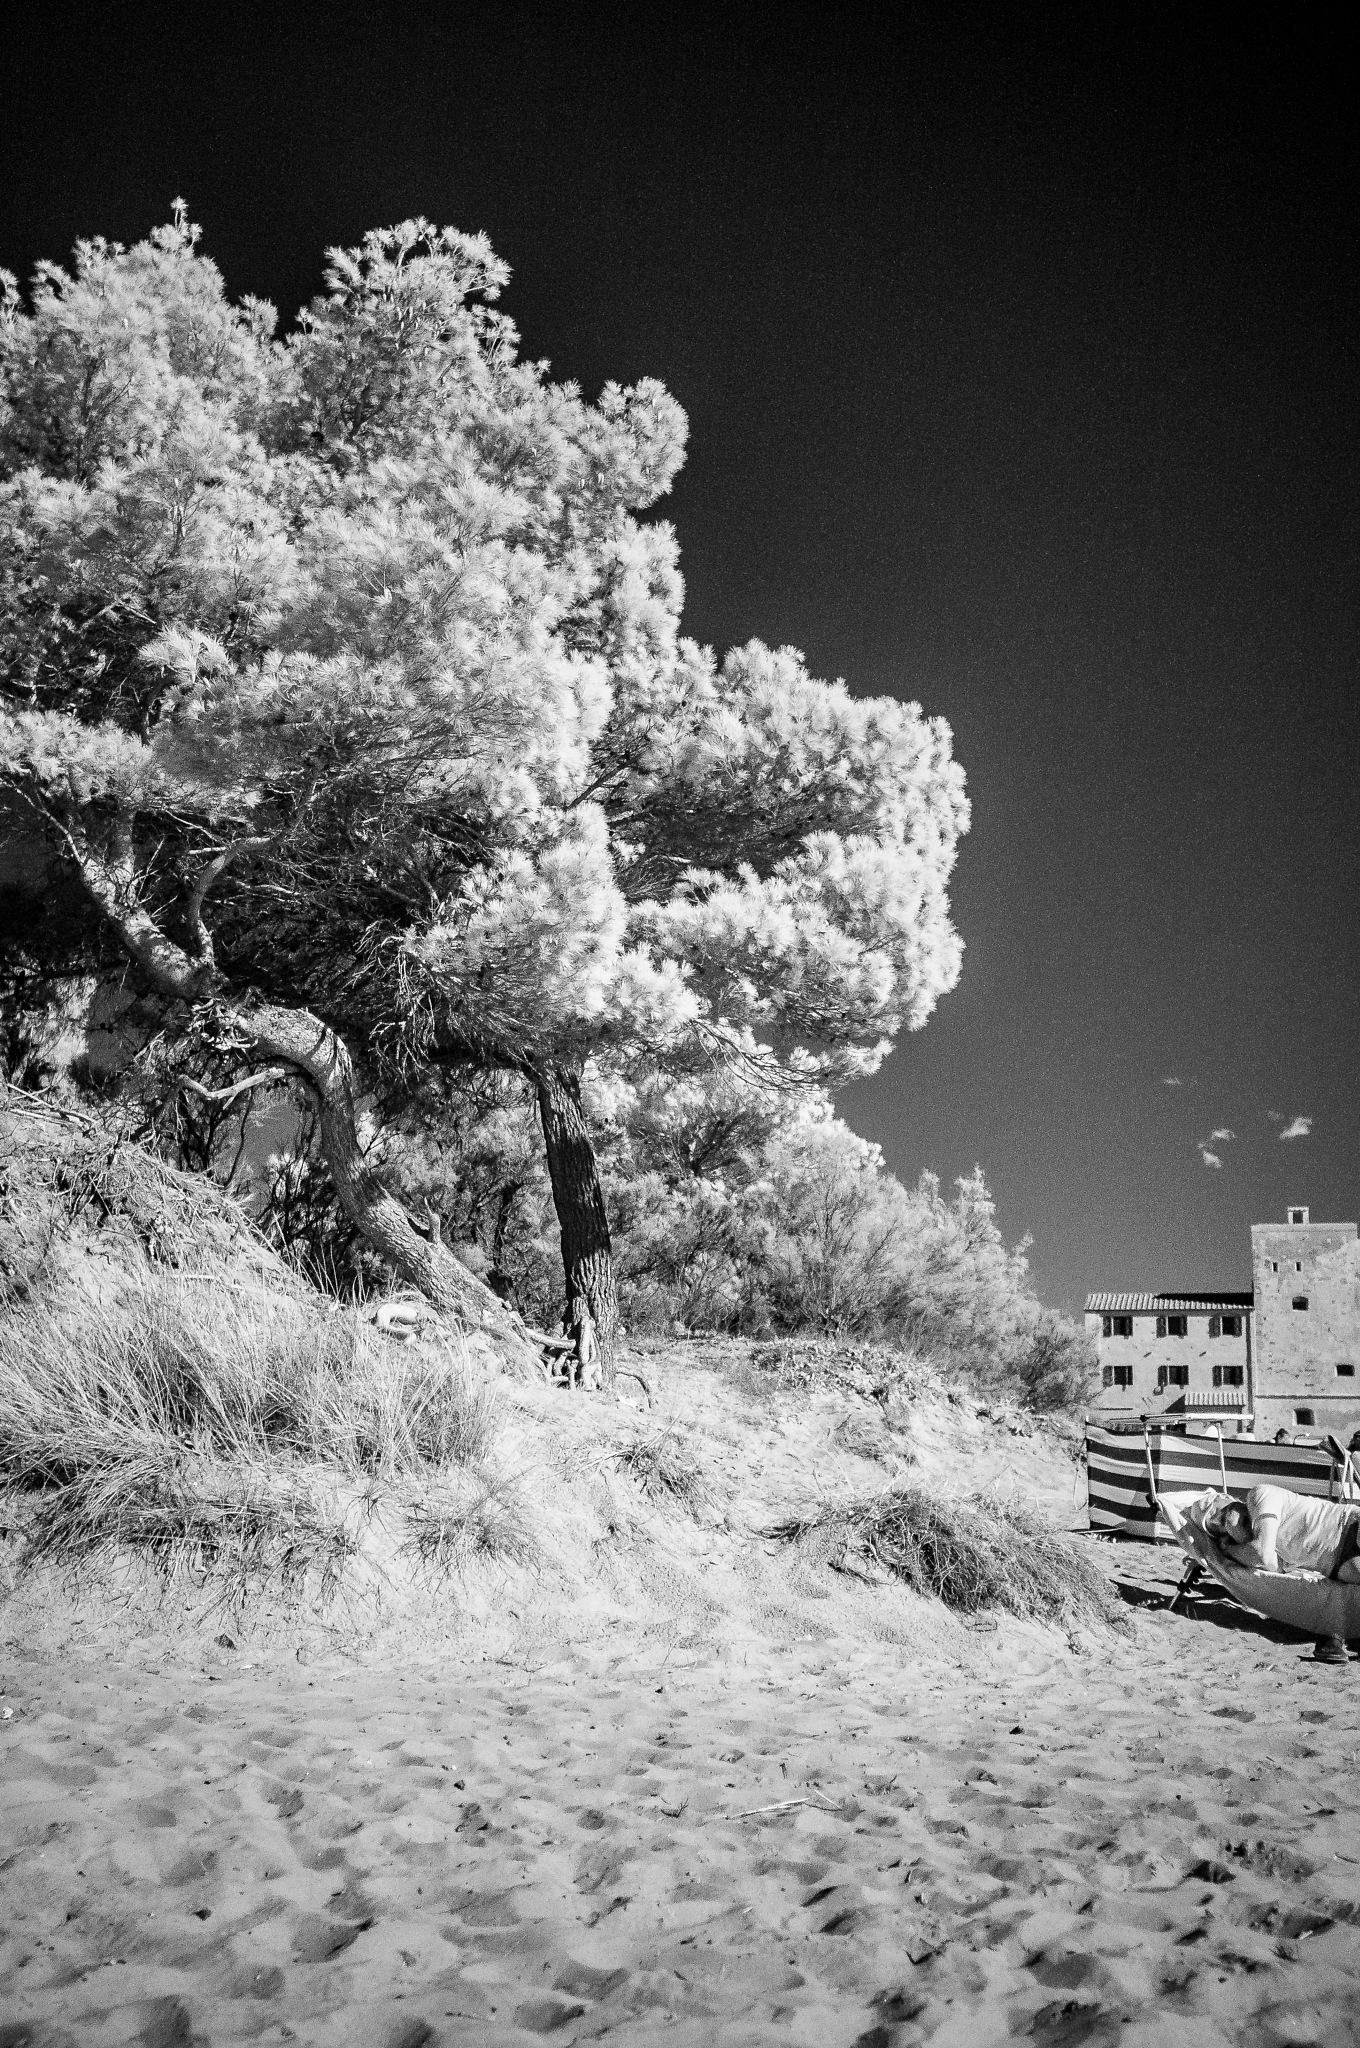 Untitled by Lucio Barabesi